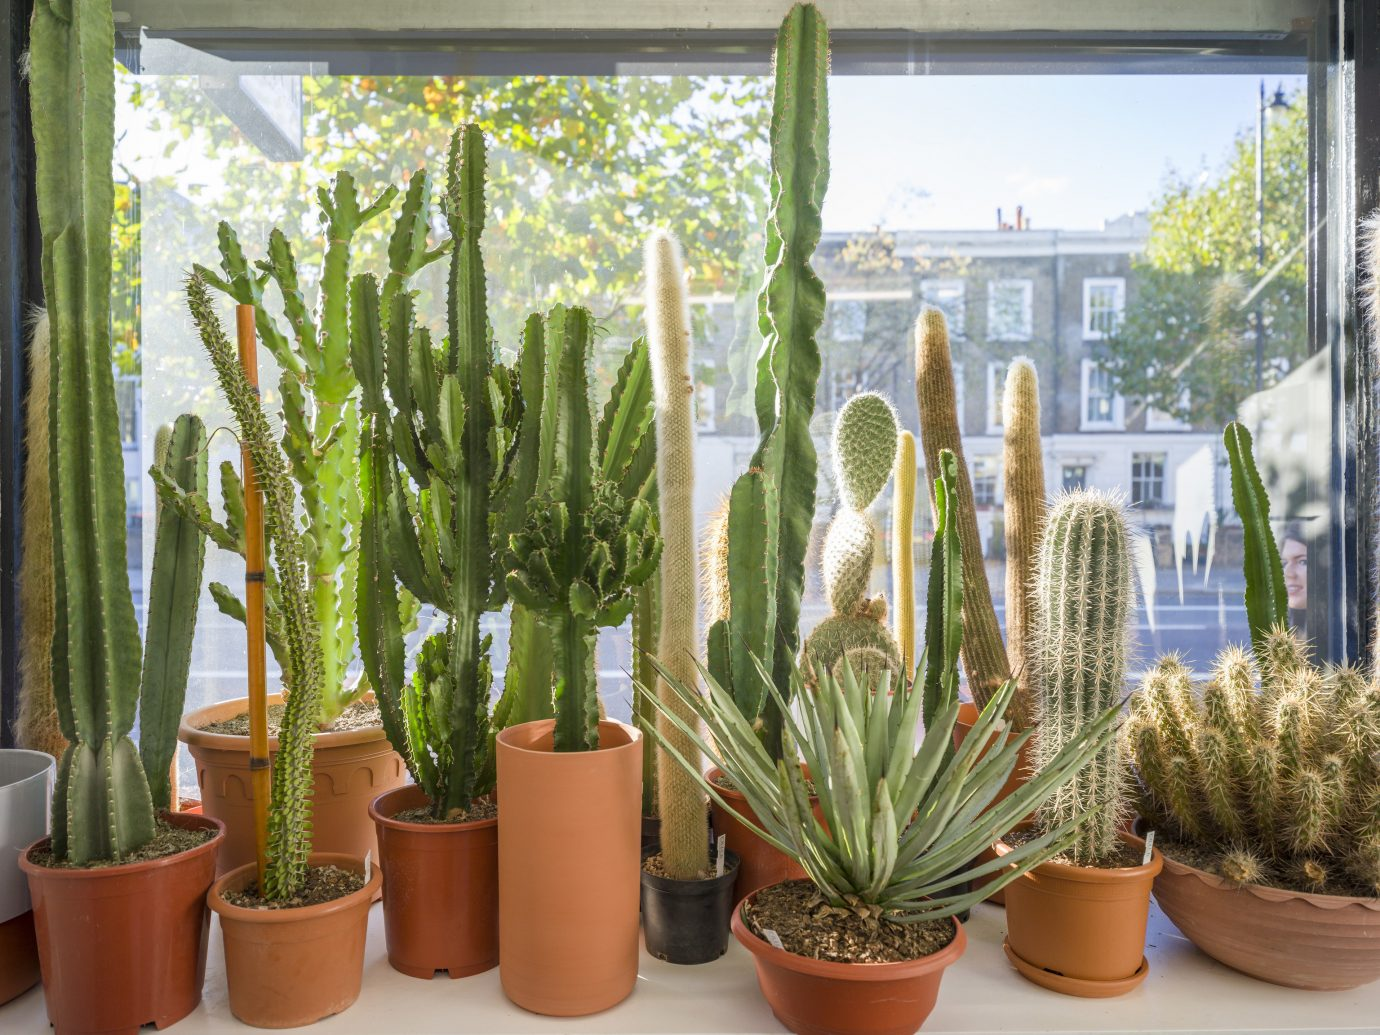 Offbeat Style + Design Travel Trends tree plant window cactus flowerpot hedgehog cactus houseplant flowering plant san pedro cactus caryophyllales agave palm several